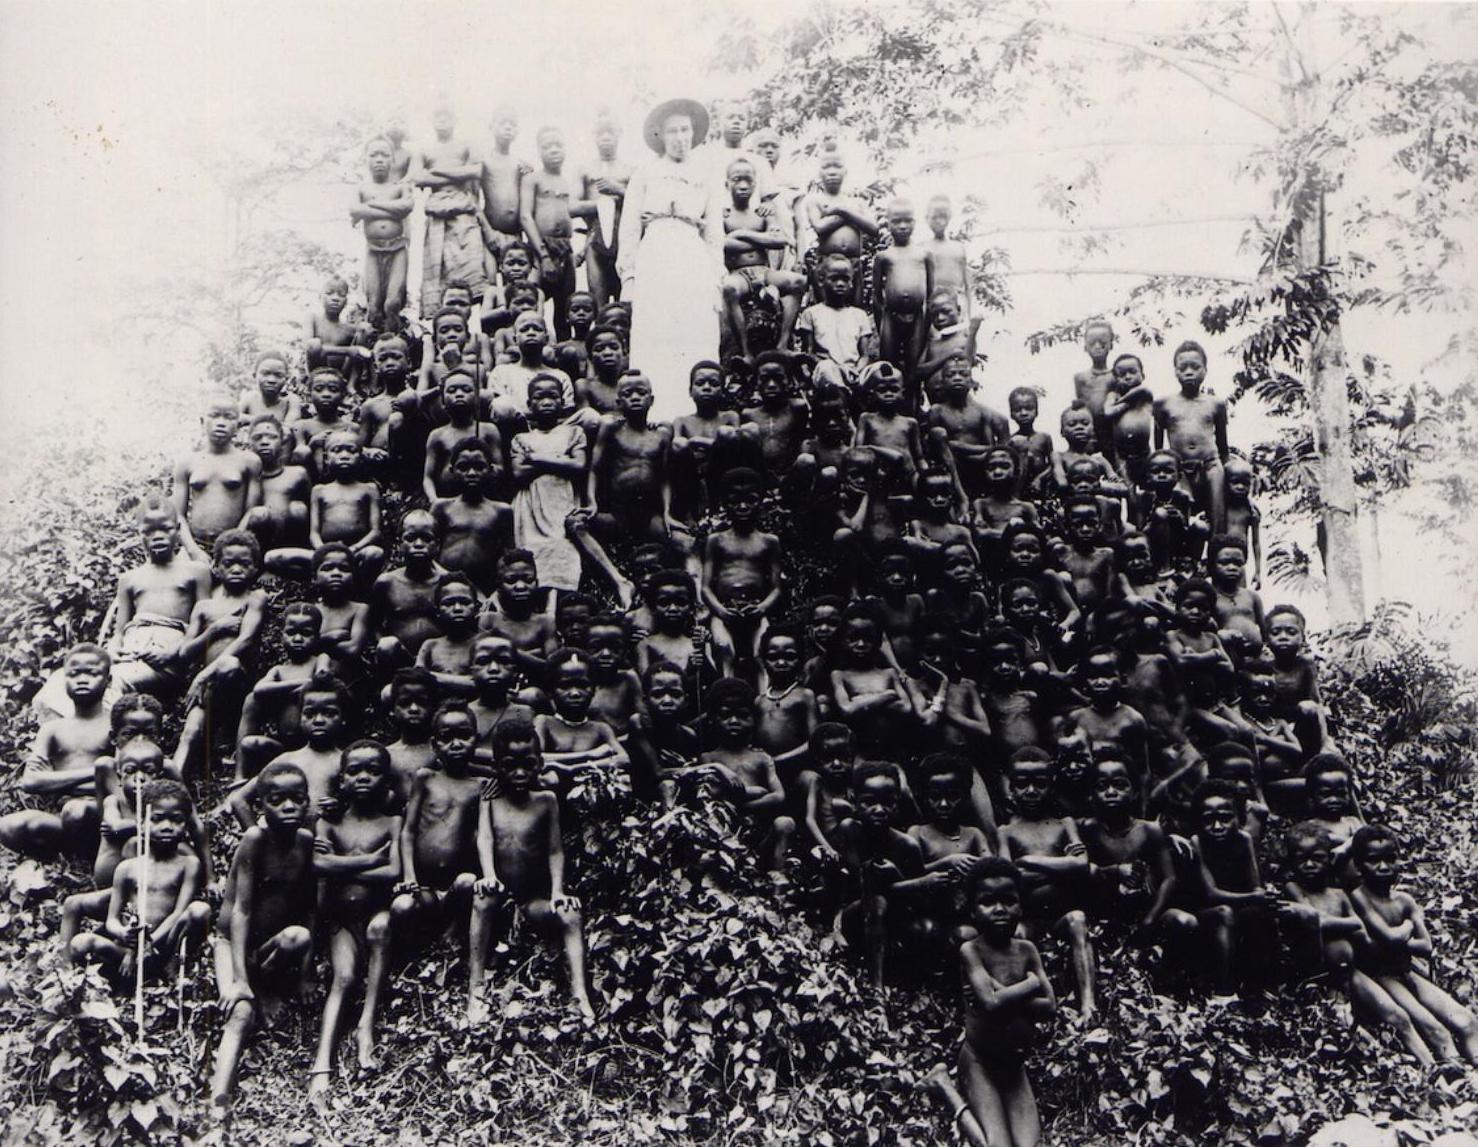 Congo, Colonialism, British Colonialism, African History, Black History, African Slave Trade, Slave Trade, KOLUMN Magazine, KOLUMN